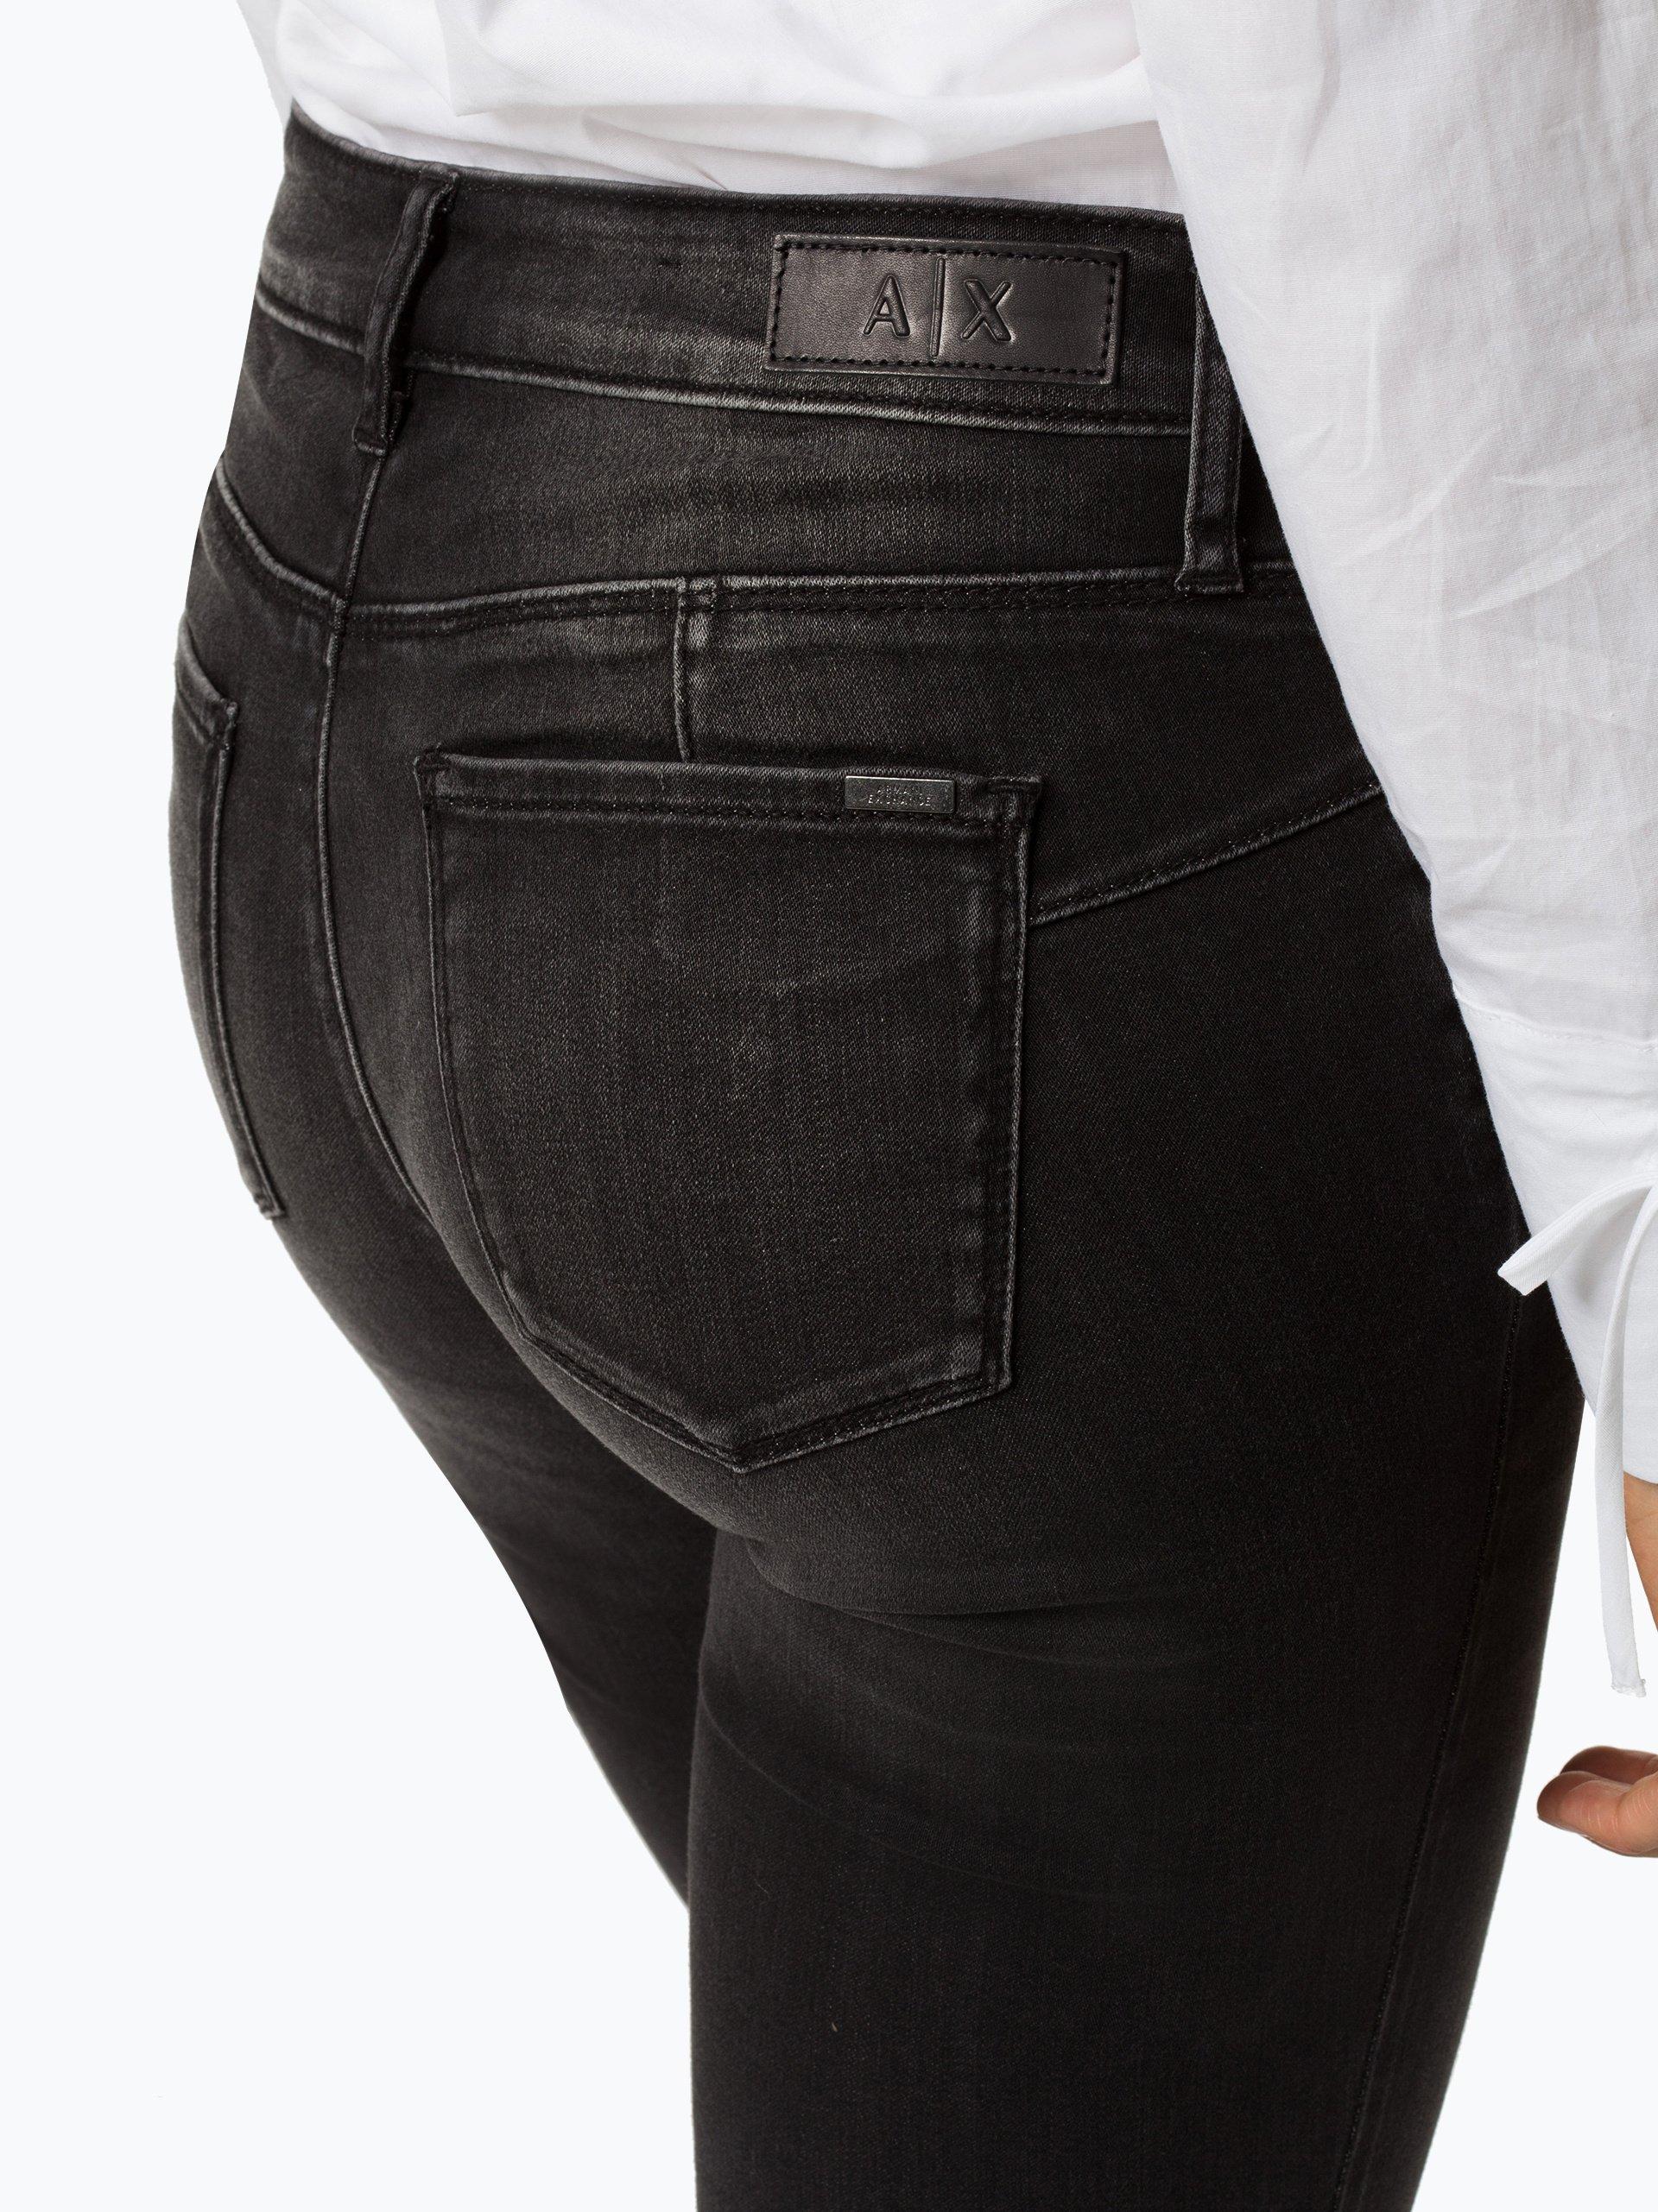 Armani Exchange Damen Jeans - J69 online kaufen   VANGRAAF.COM 887ab53db4